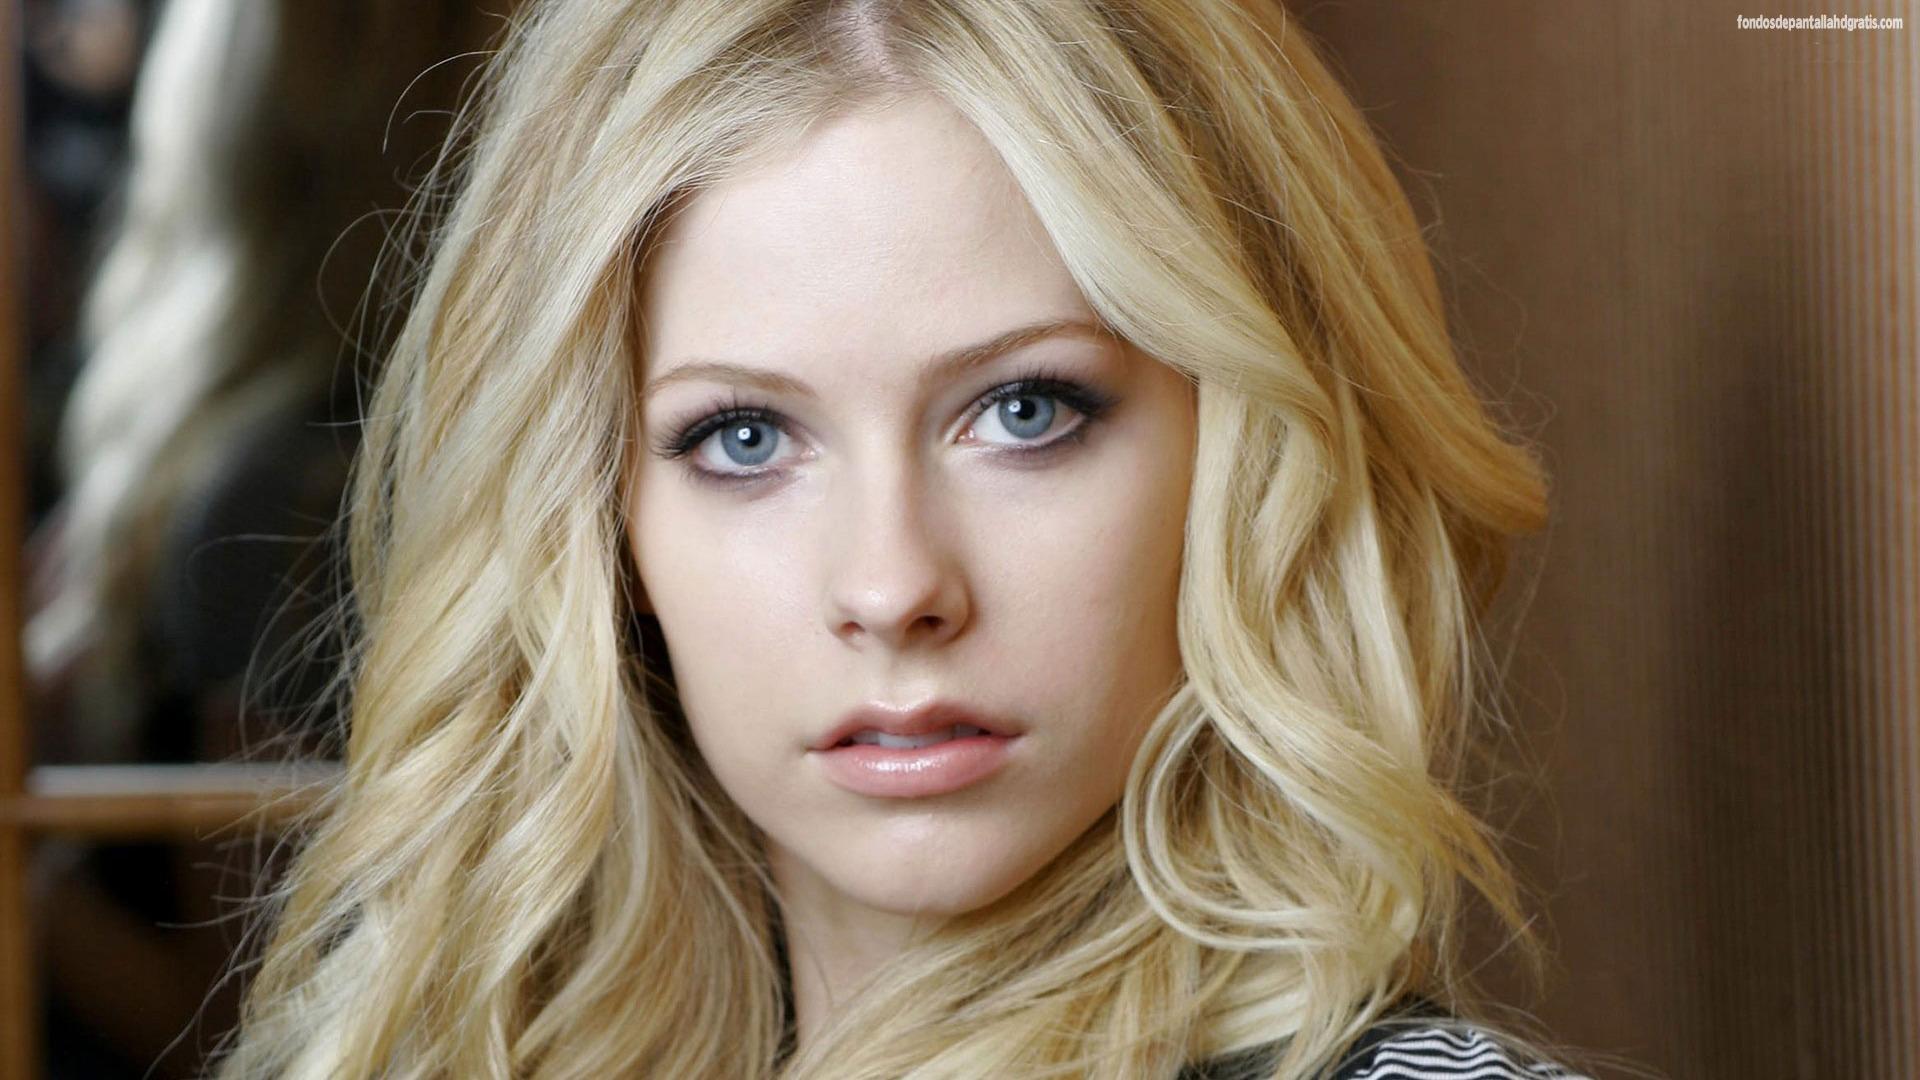 CuteSmile Avril Lavigne Image 06